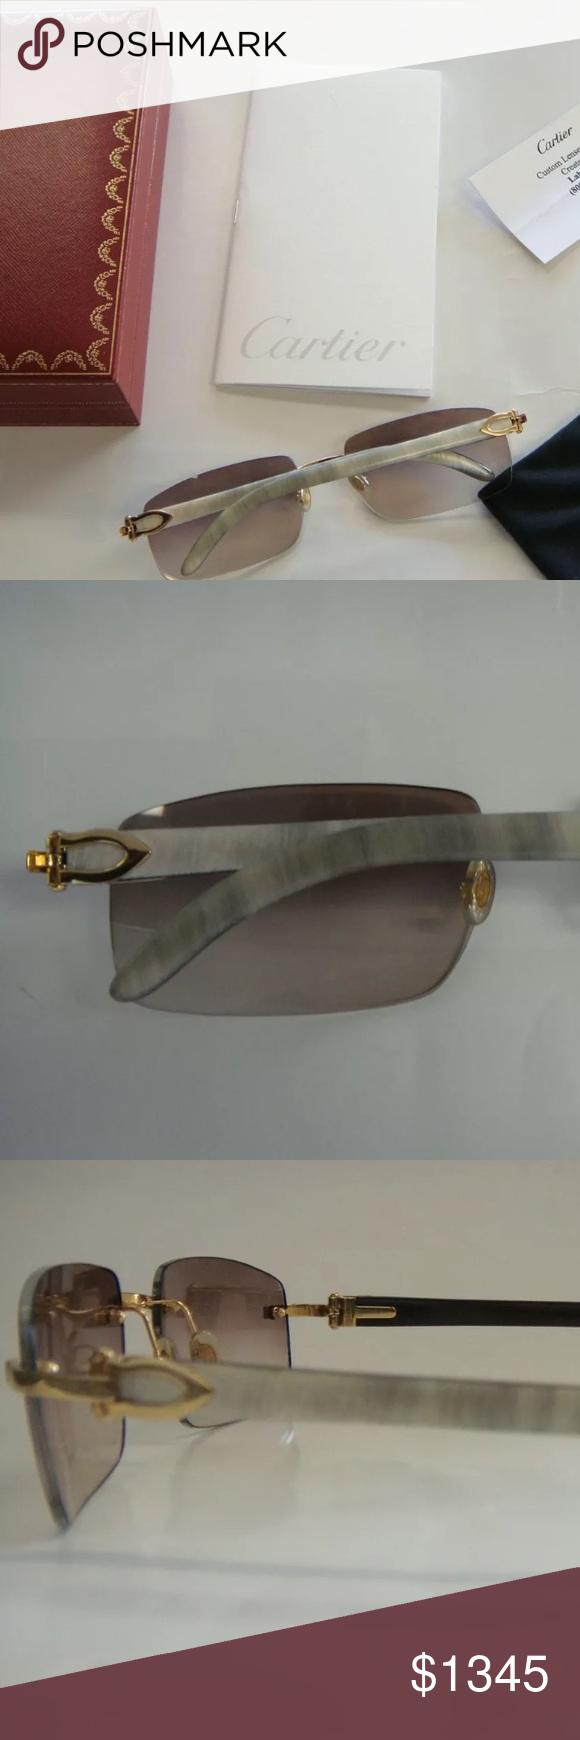 04e7e25f93a Cartier Rare sunglasses White Buffalo C Decor FOR SALE IS A 100% AUTHENTIC CARTIER  WHITE